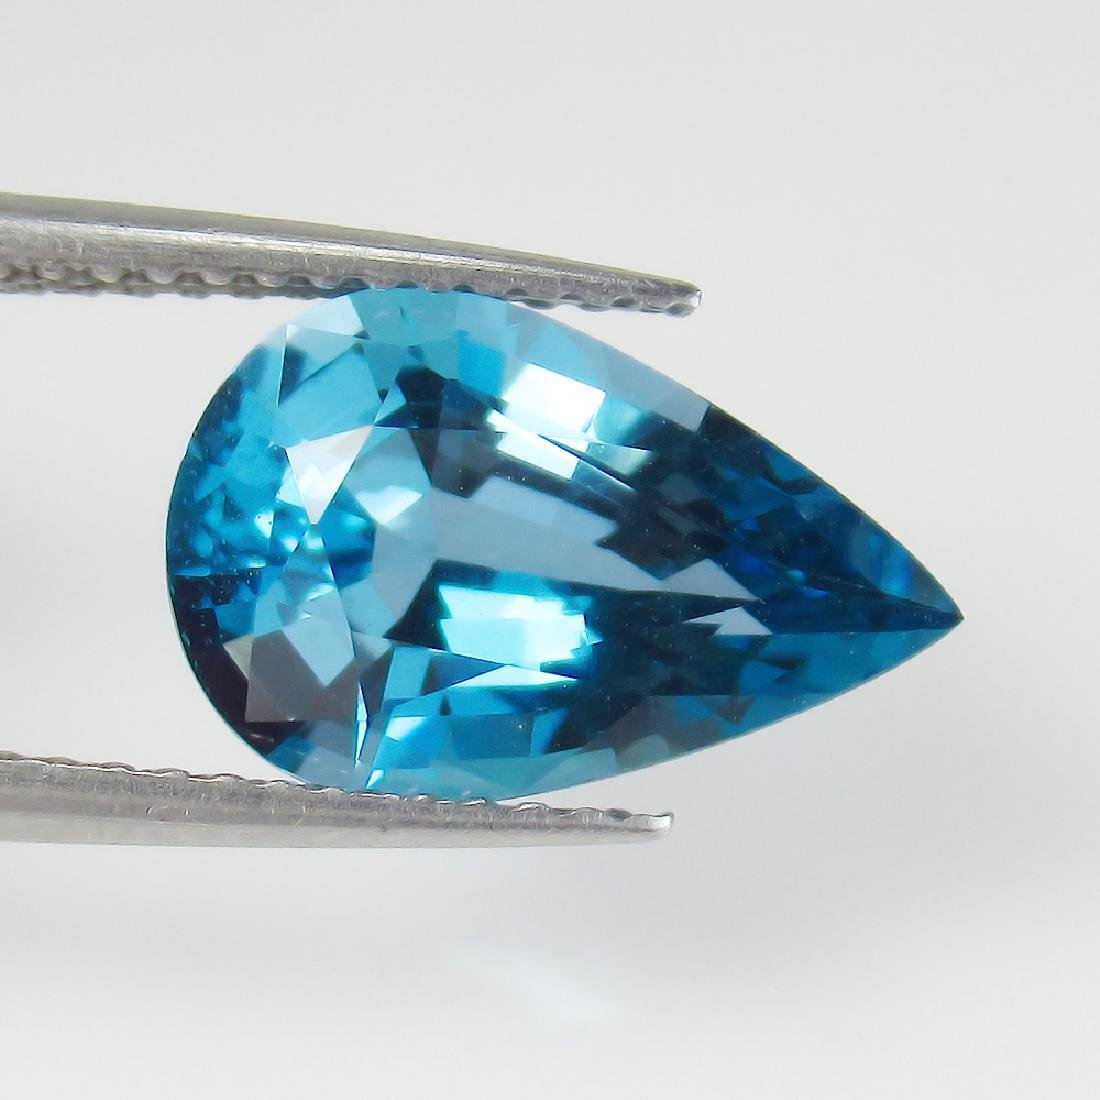 3.38 Ctw IGI Certified Natural London Blue Topaz Pear